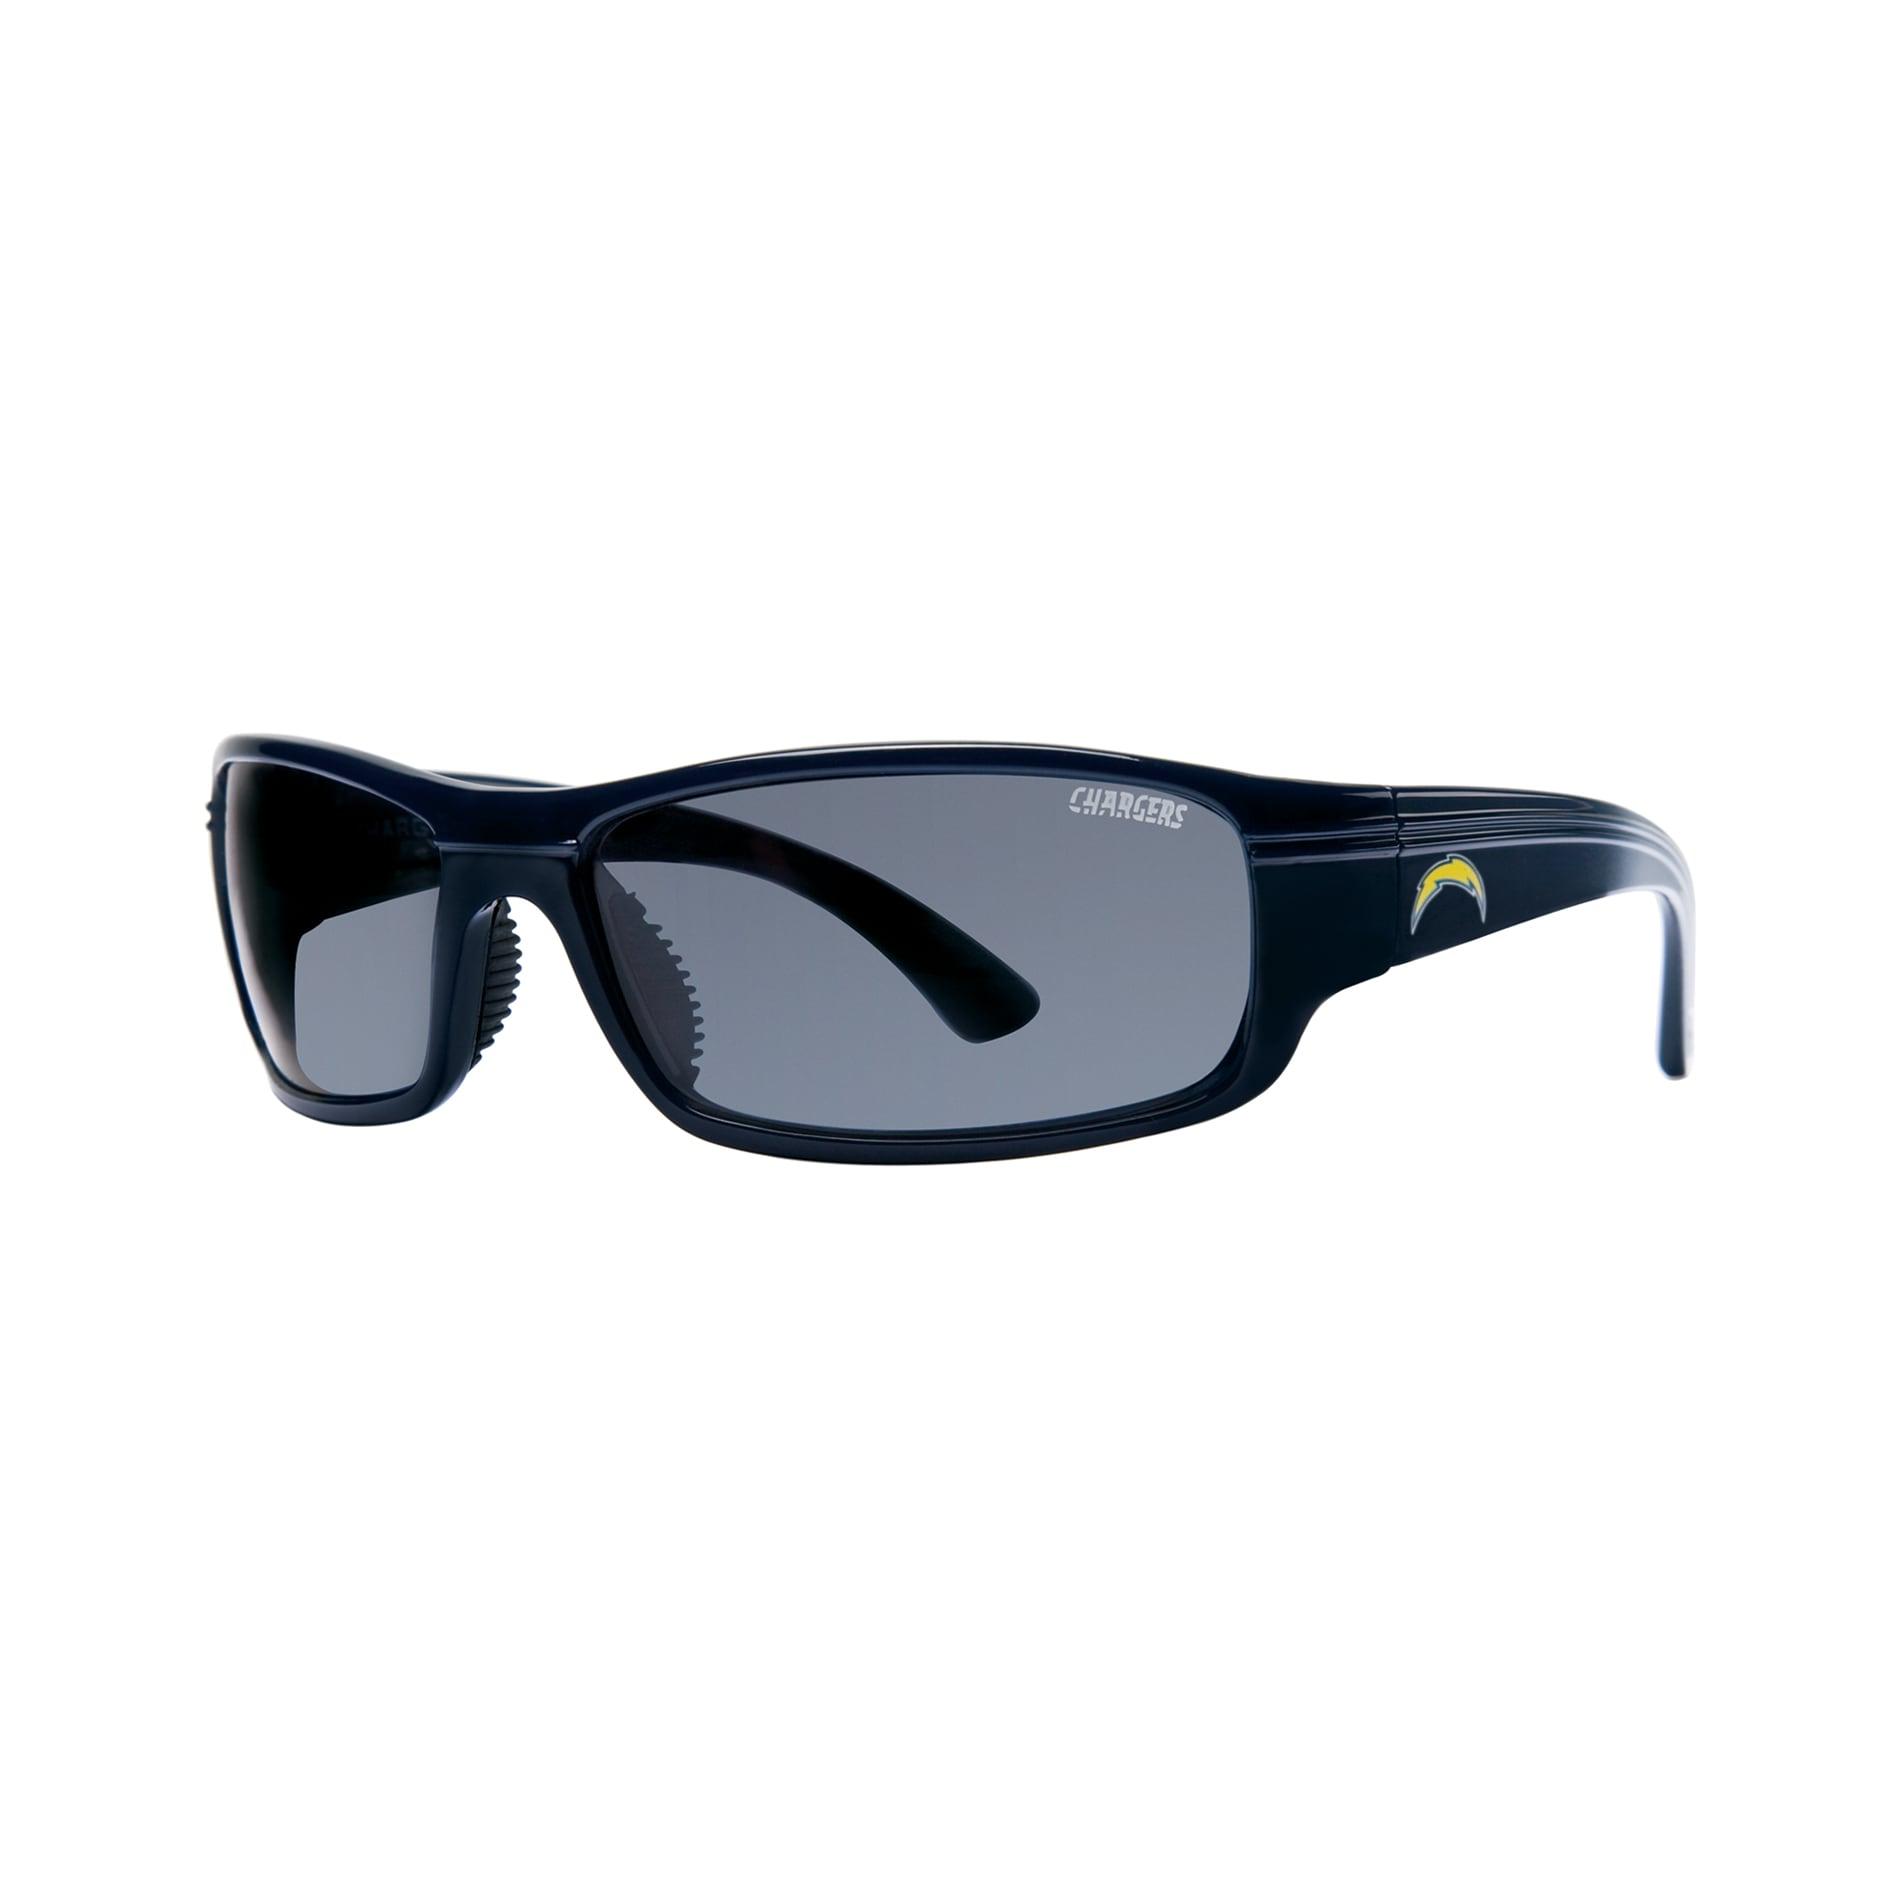 Modo San Diego Chargers Men's 'Block 2' Sunglasses